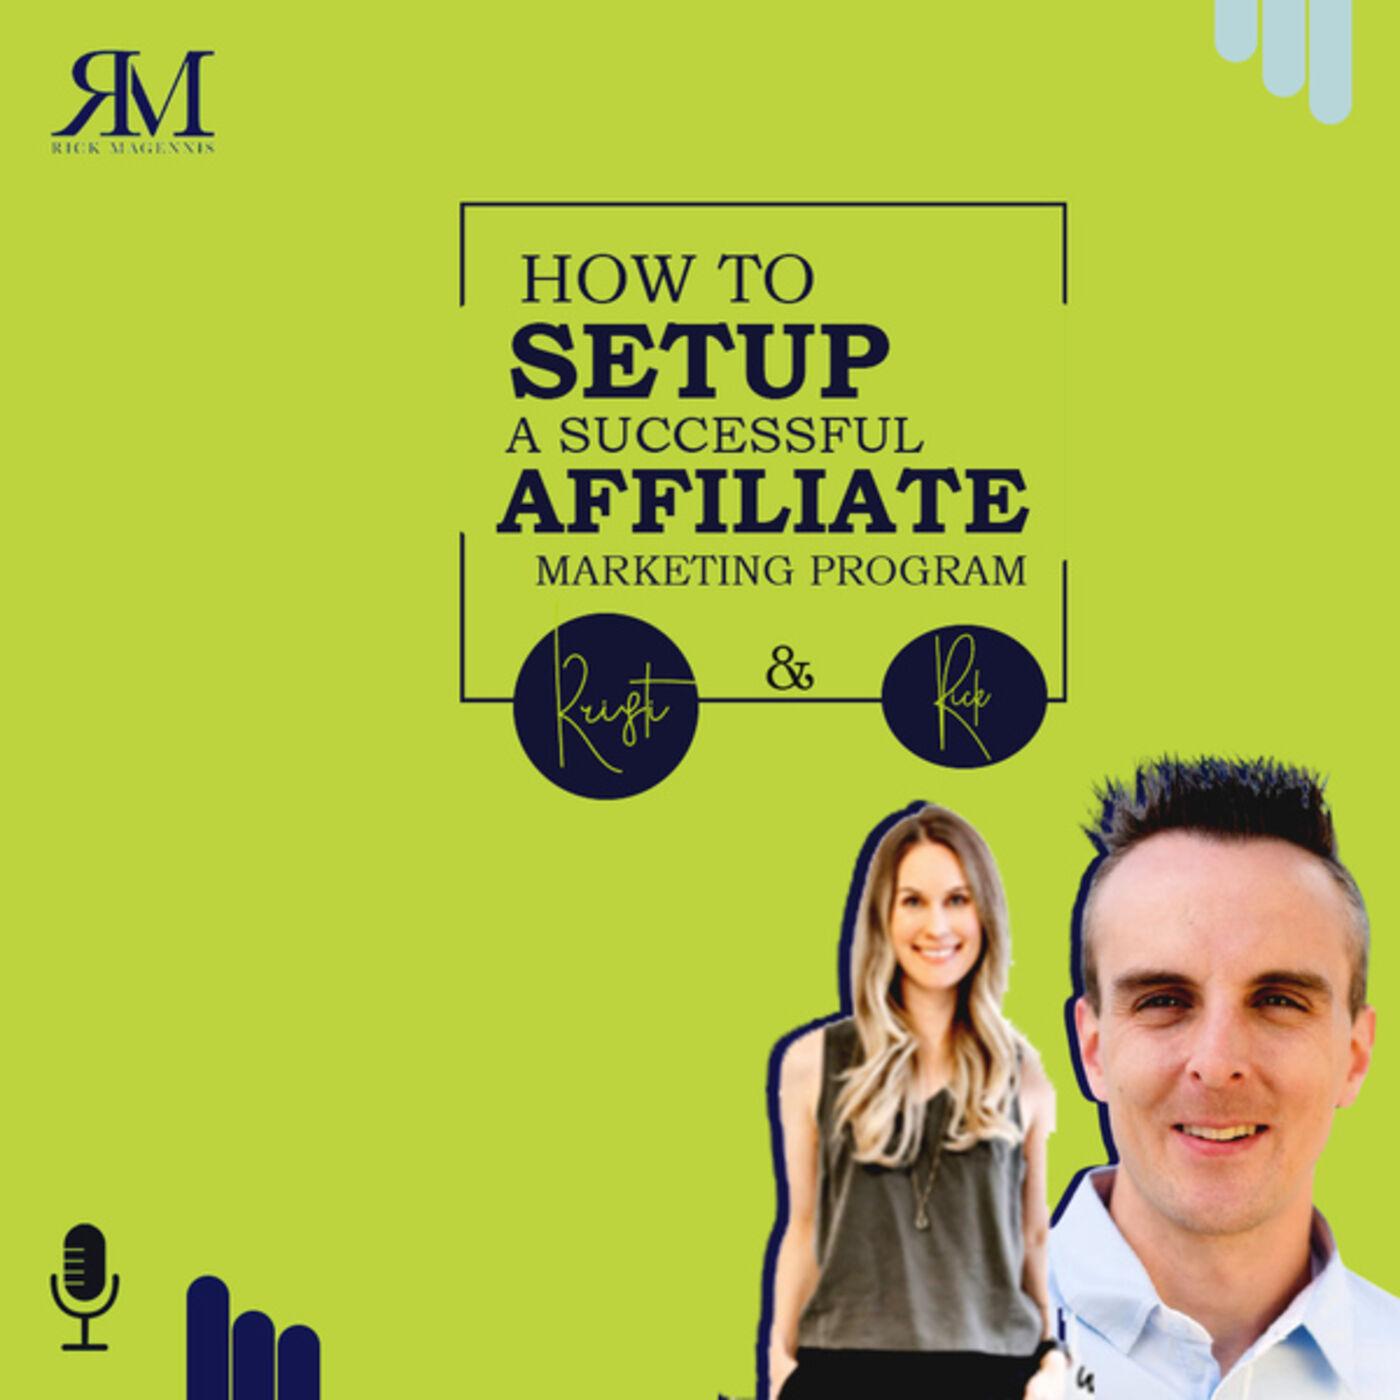 How to Setup a Successful Affiliate Marketing Program